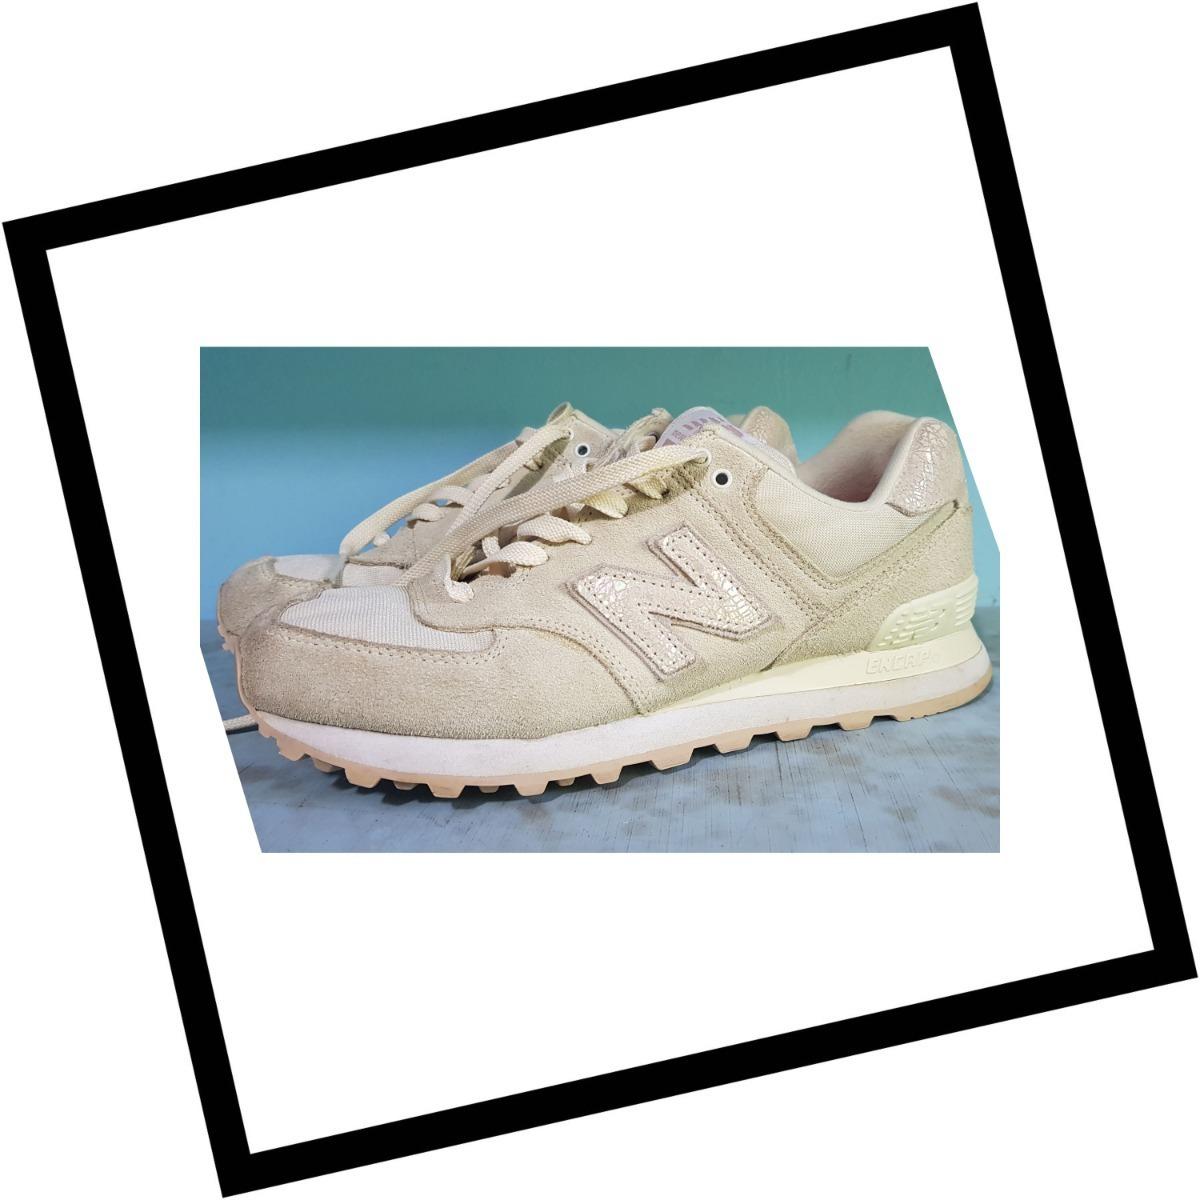 Zapatillas Urbanas Mujer New Balance 574 Nº 38.5. Poco Uso